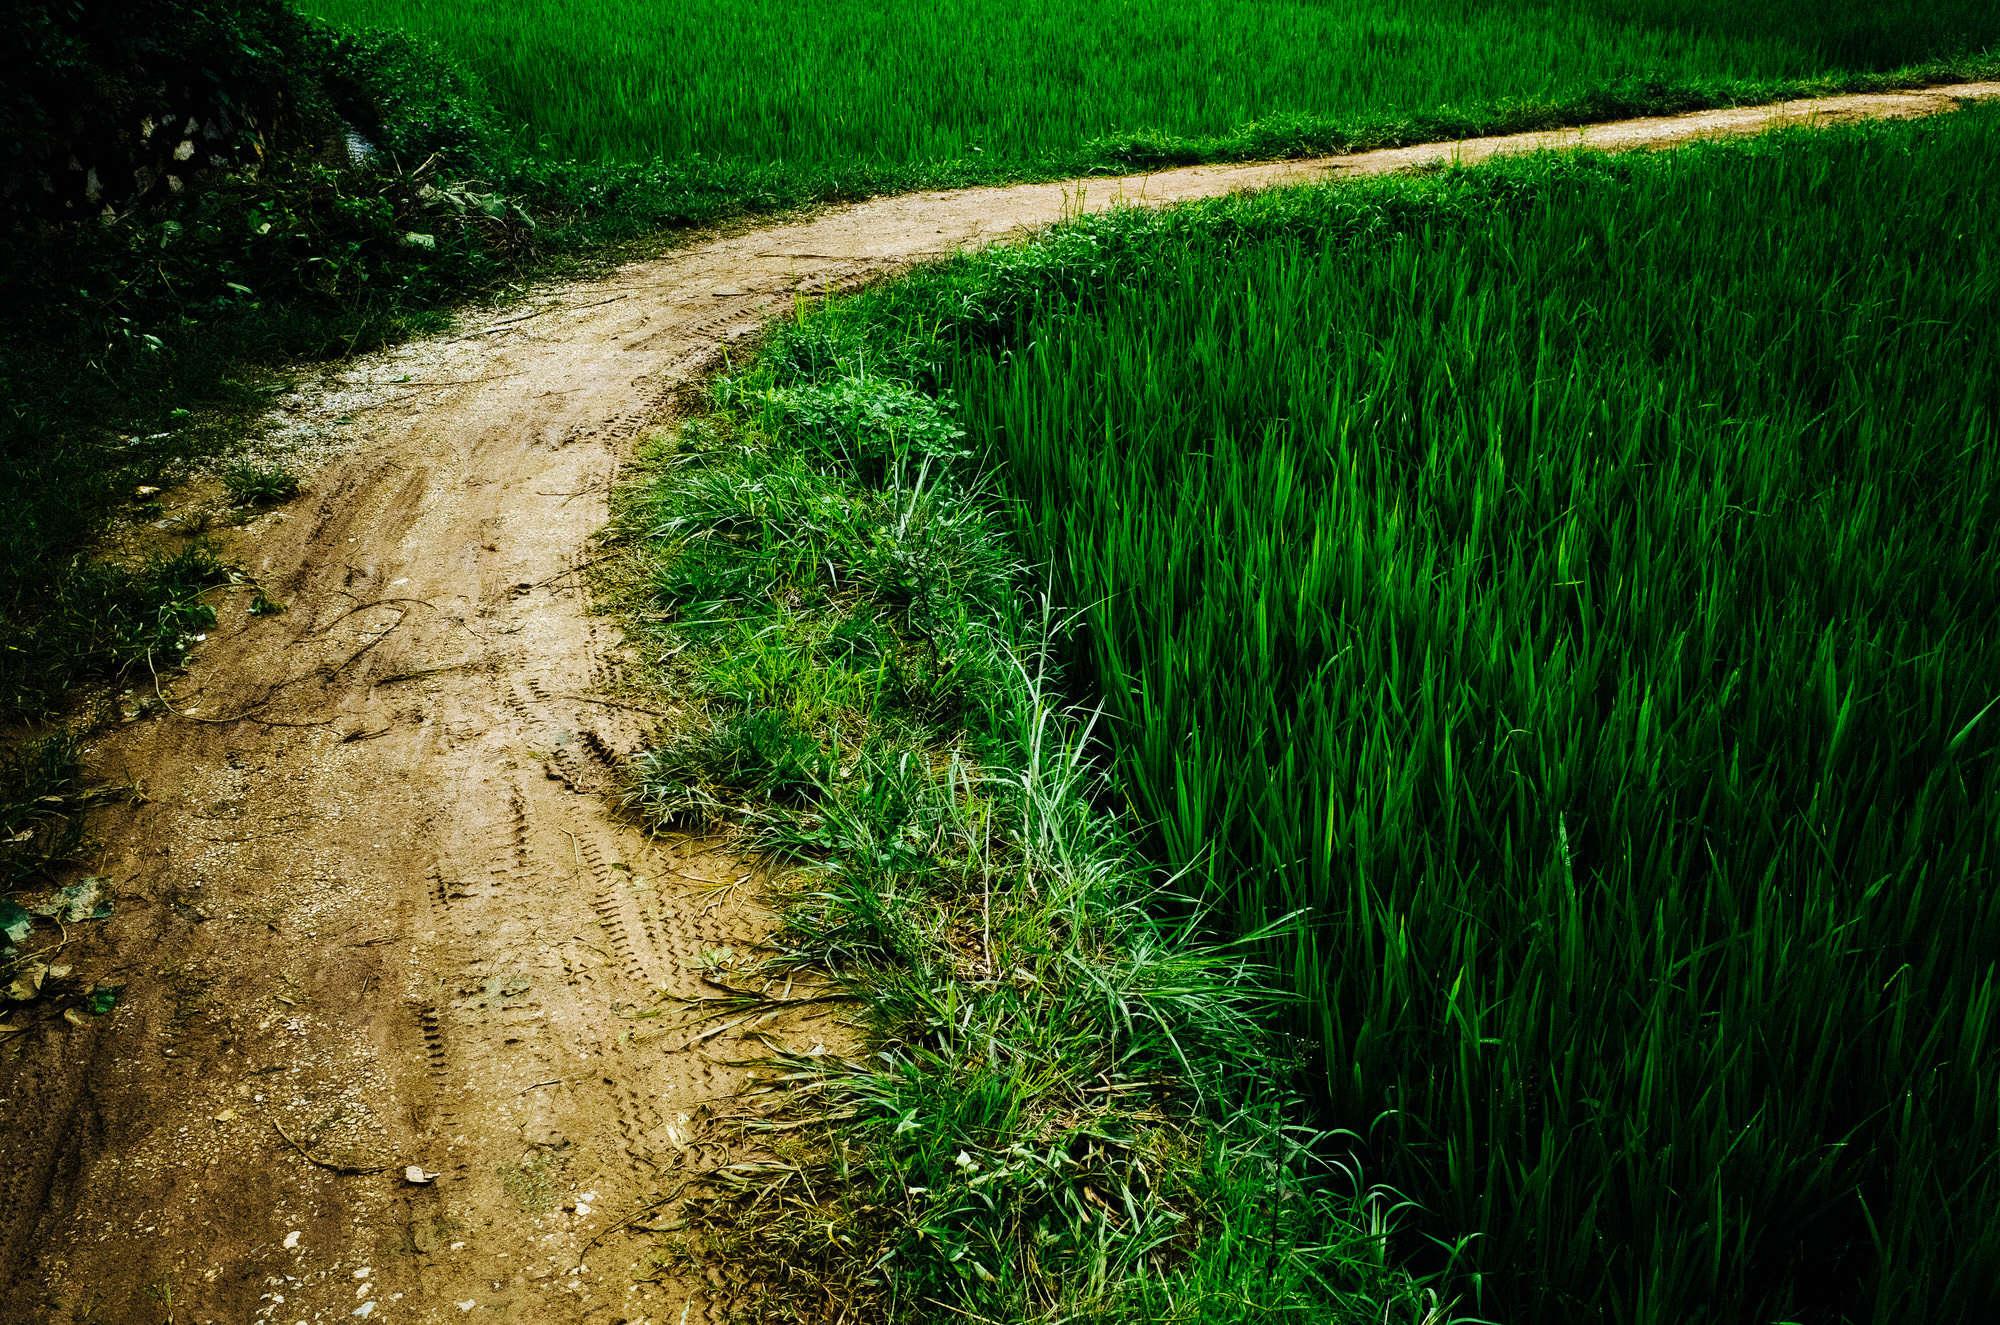 eric-kim-street-photography-hanoi-vietnam-ricoh-gr-ii-28mm-0005389